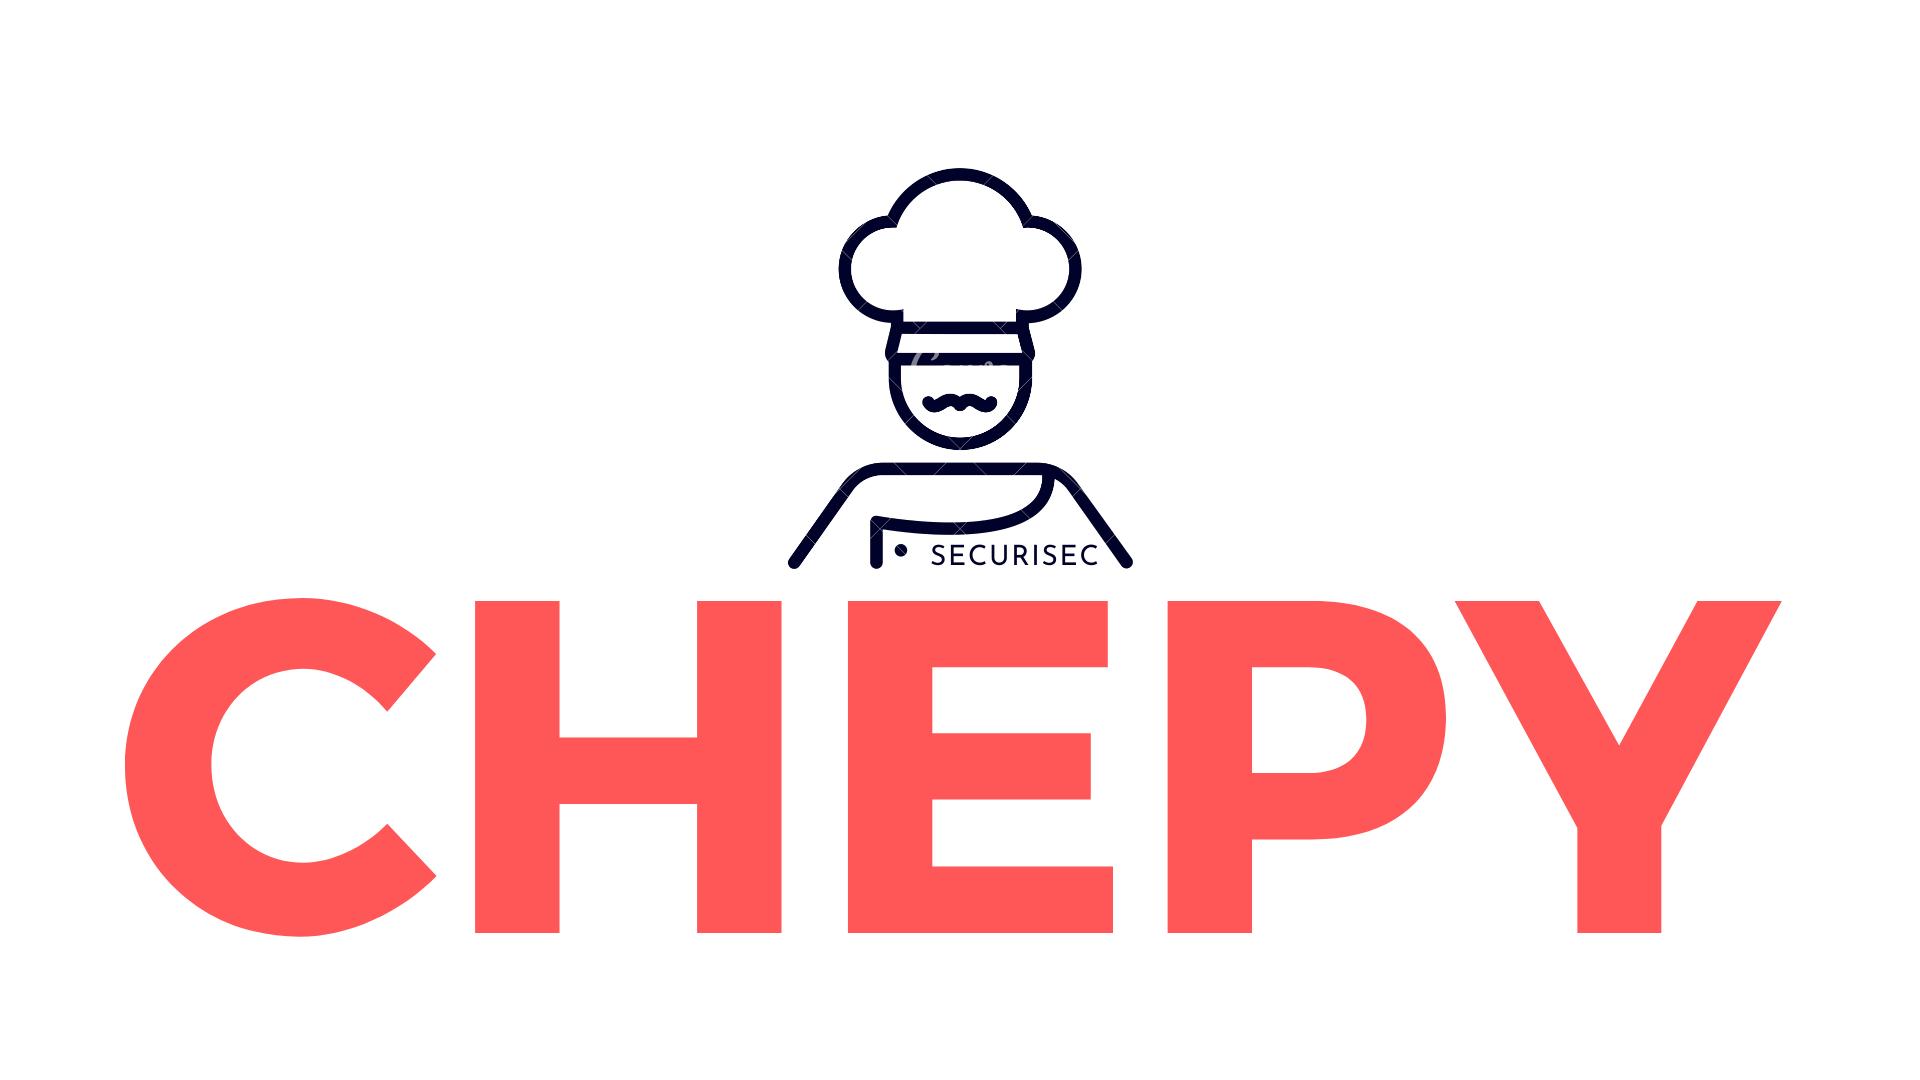 https://raw.githubusercontent.com/securisec/chepy/master/logo.png